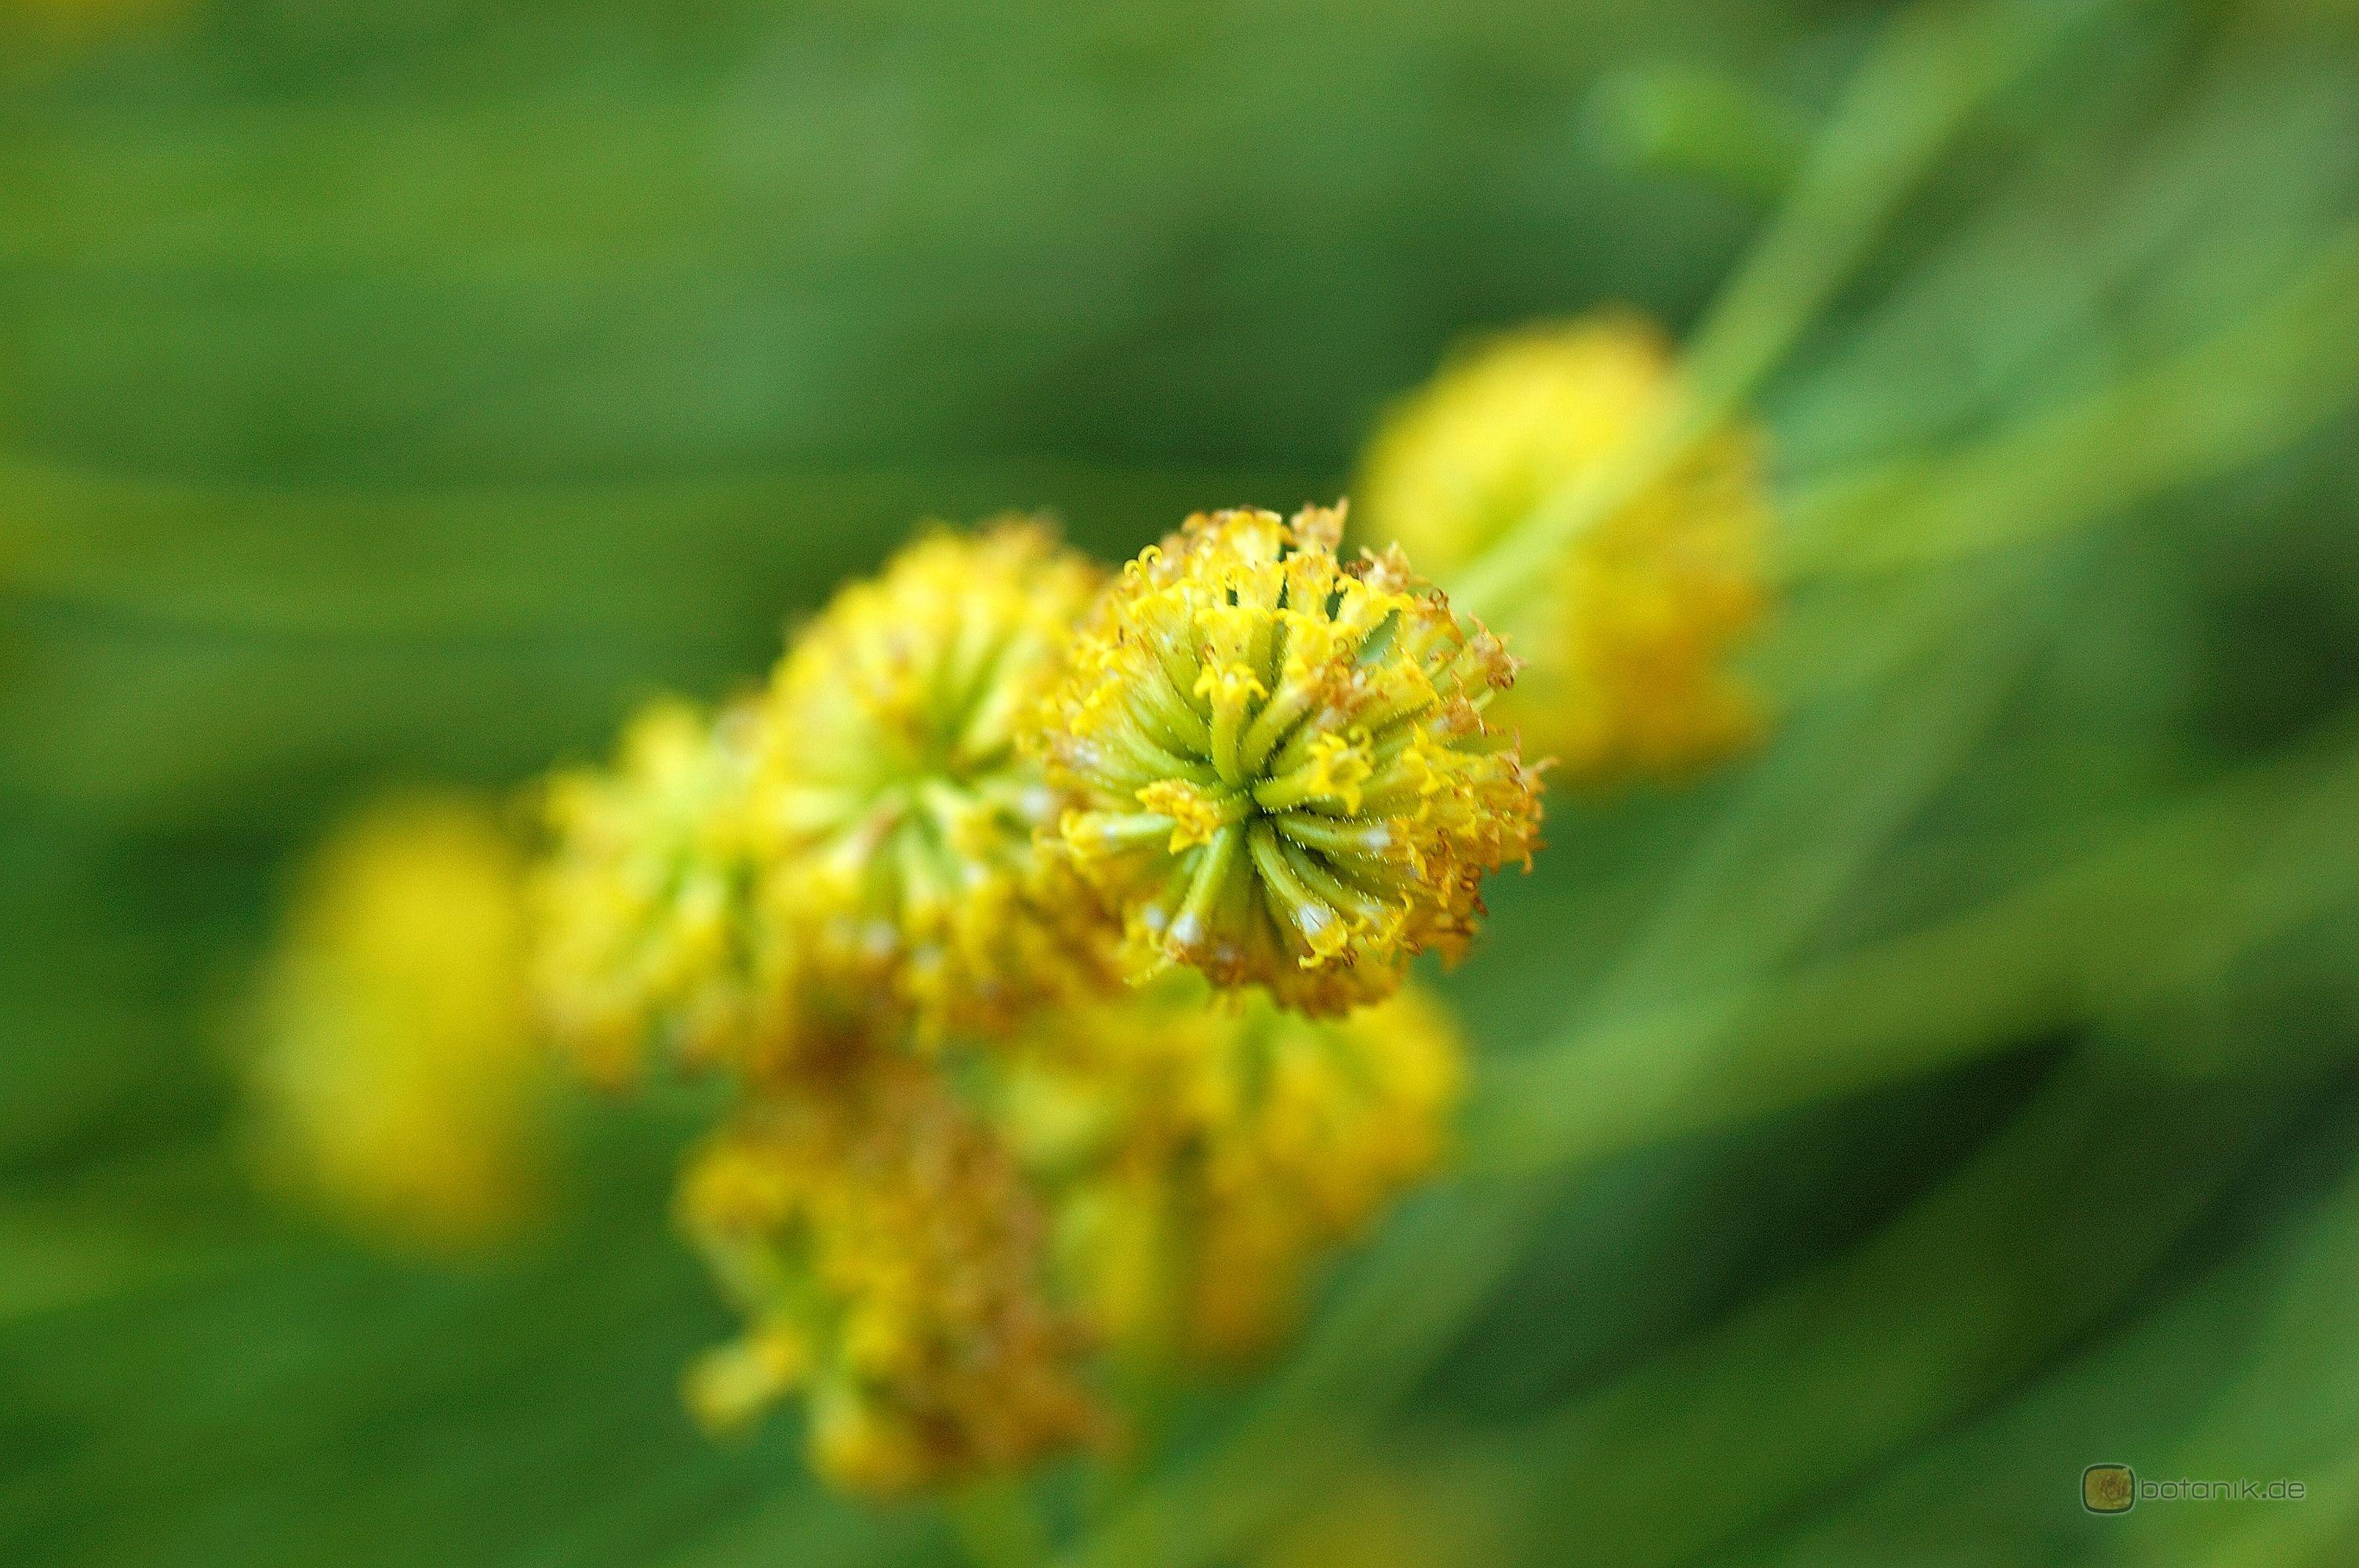 Santolina chamaecyparissus 'squarrosa' -- Graues Heiligenkraut 'squarrosa'